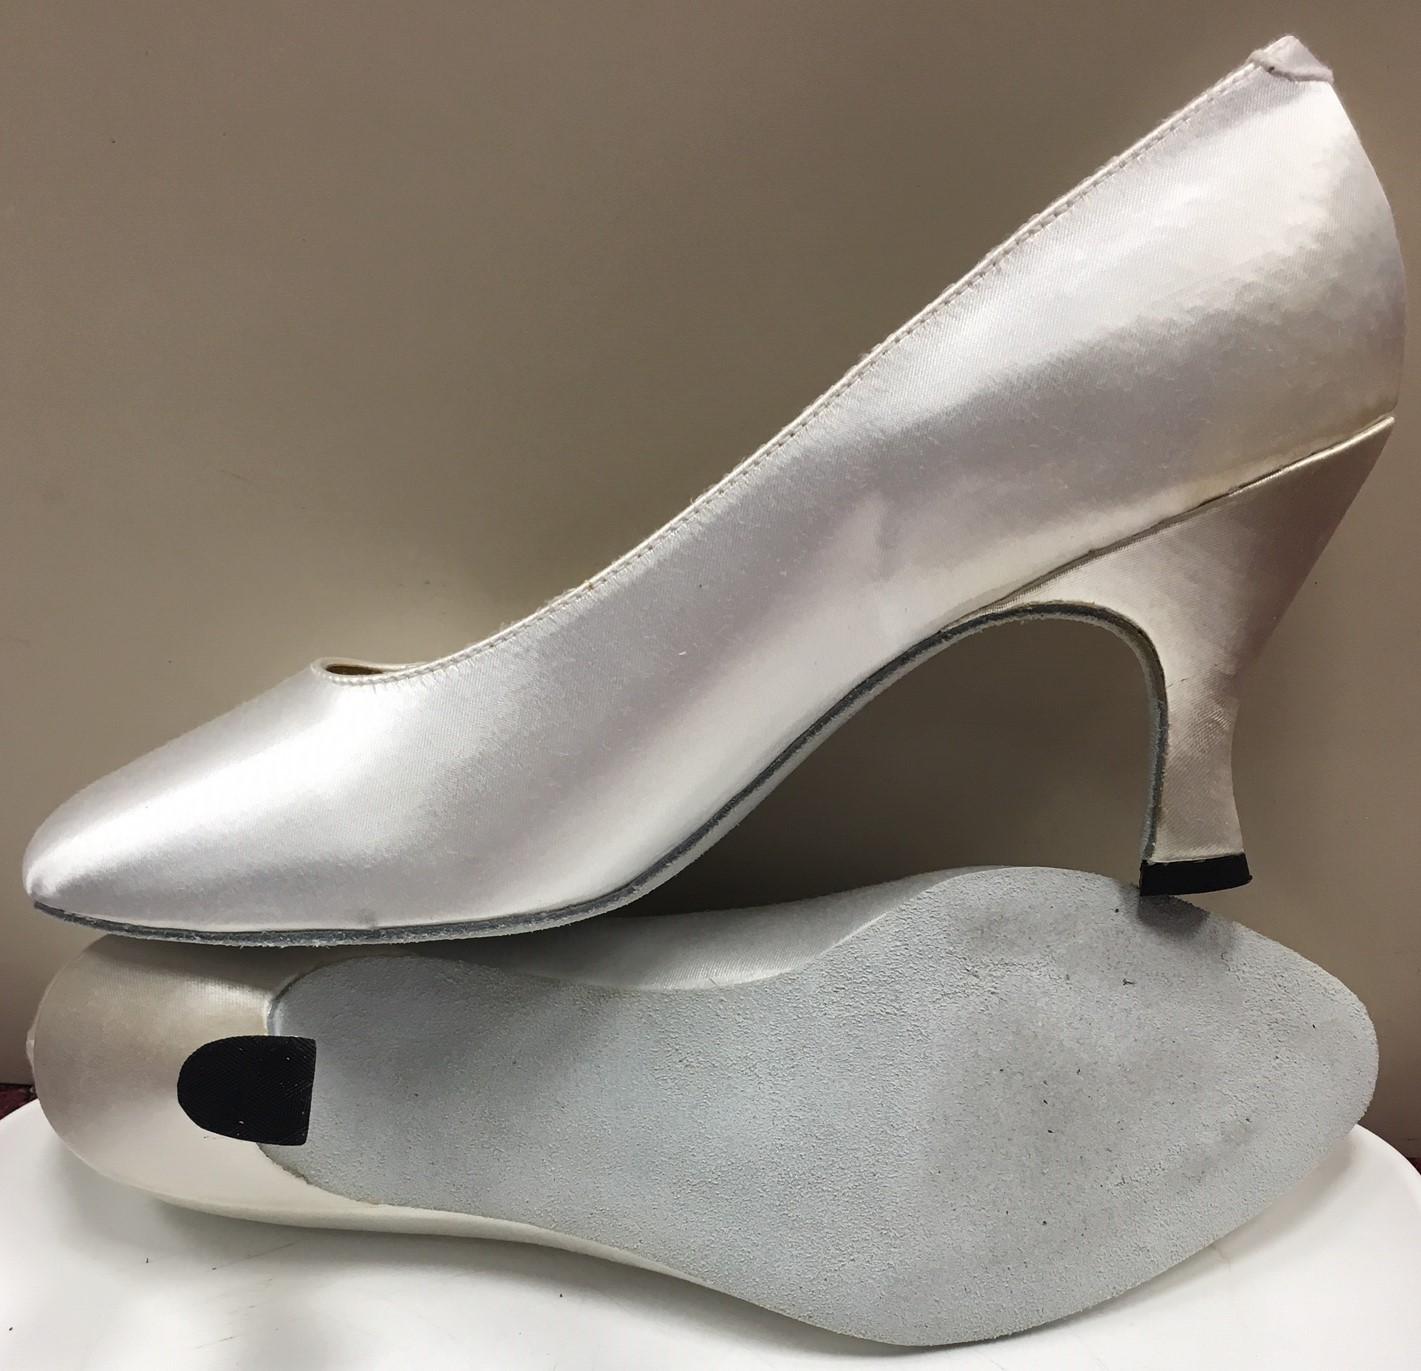 Capezio Women's Court 2 1/2 Ballroom Shoes